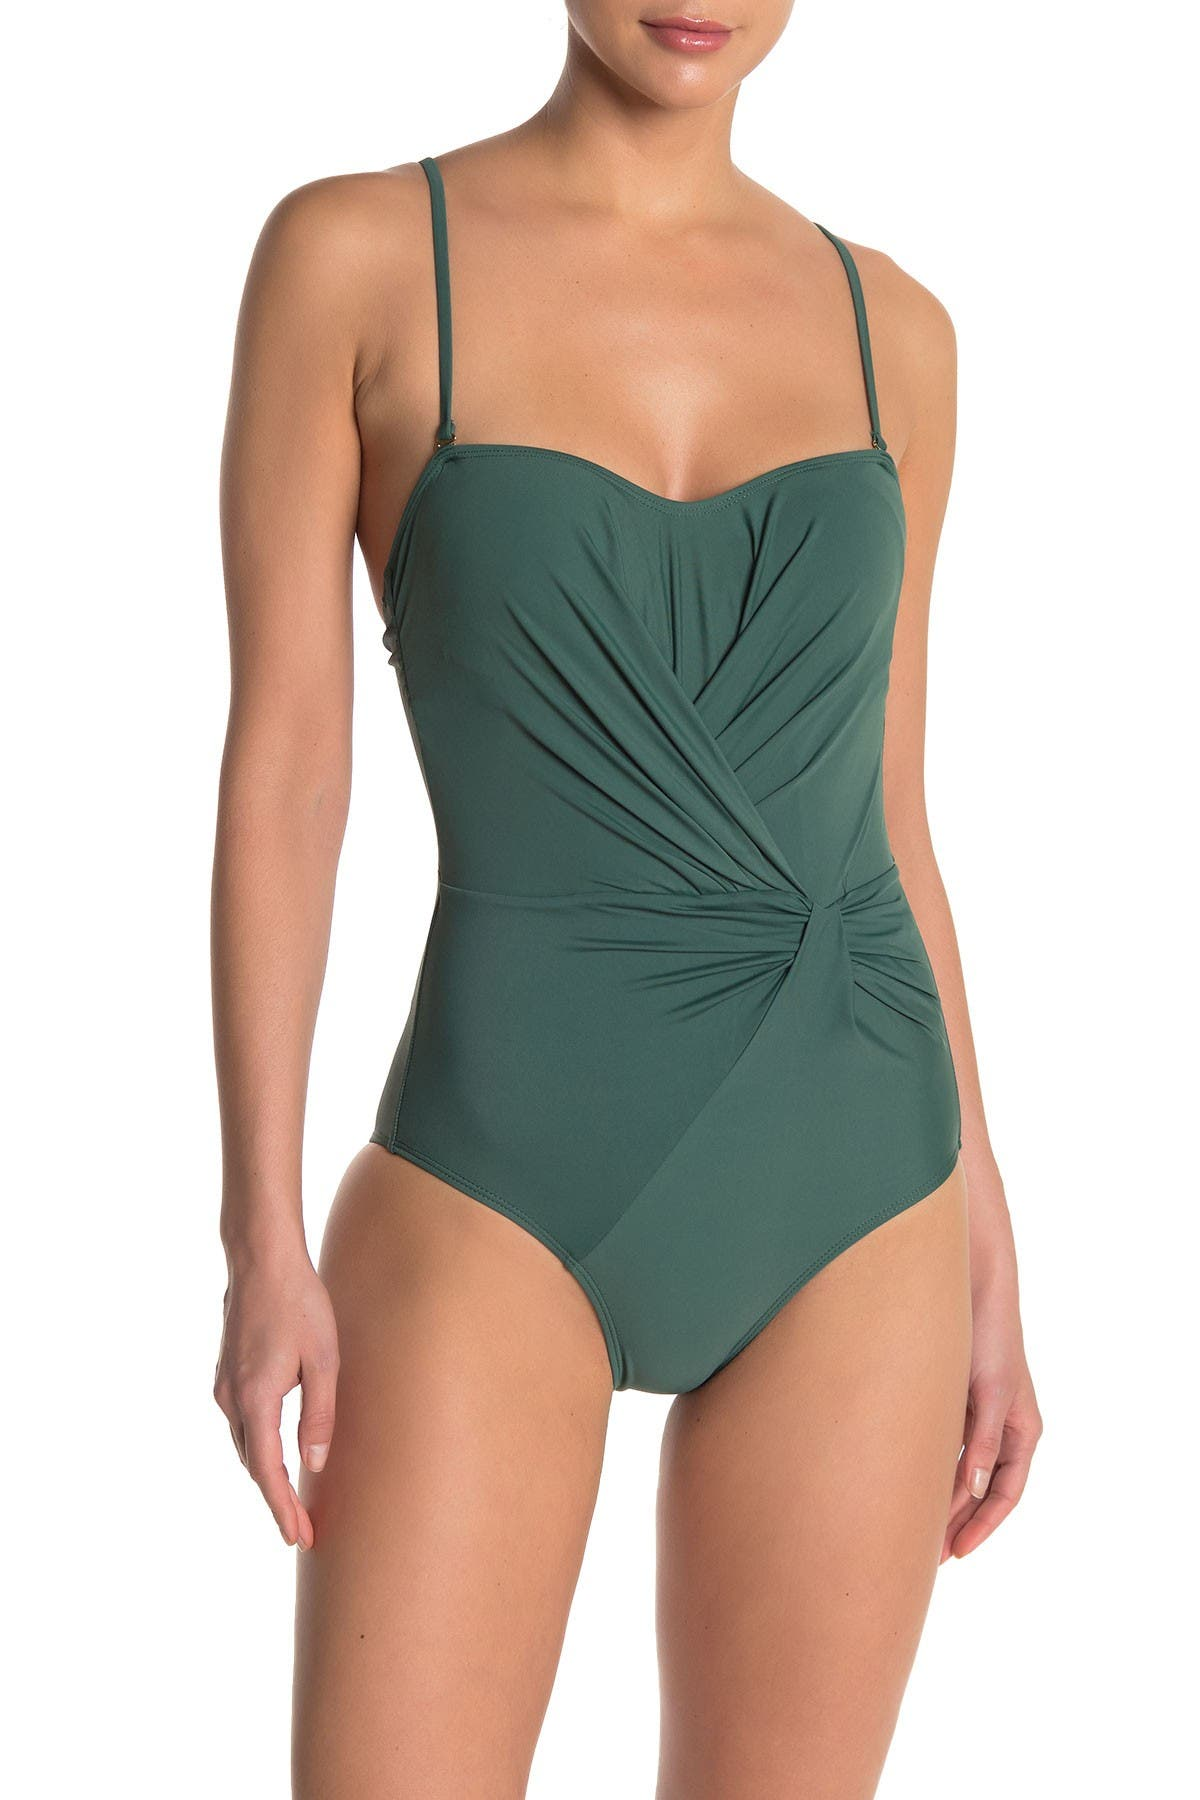 Image of Nicole Miller Twist Bandeau One-Piece Swimsuit